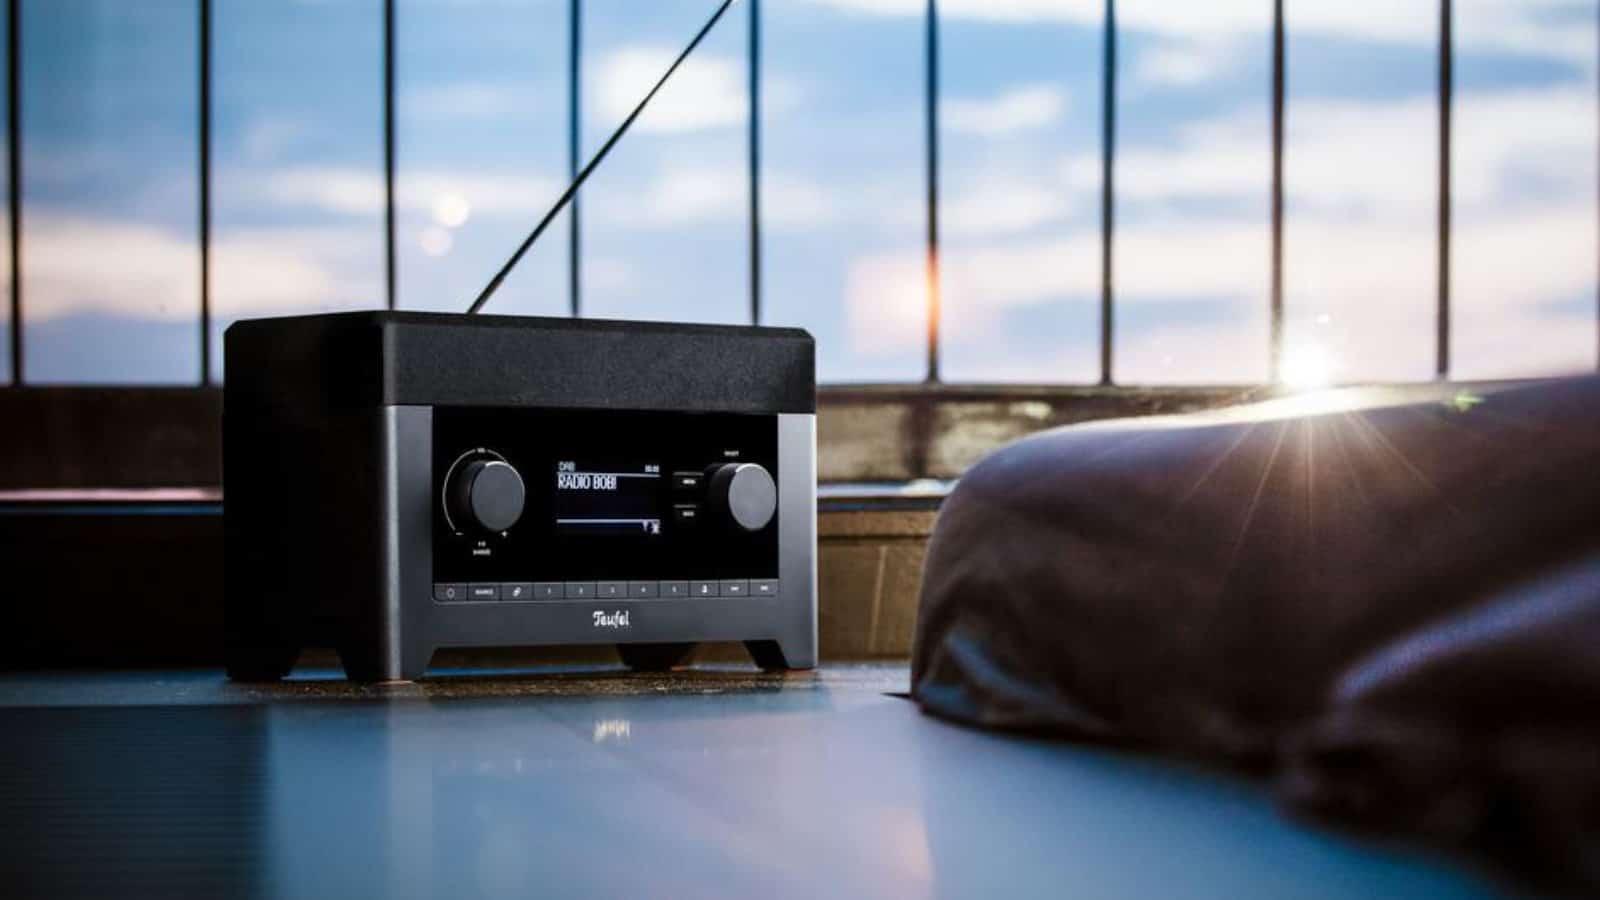 Testbericht- Teufel Radio 3Sixty – Das 360 Grad Radio im Praxistest